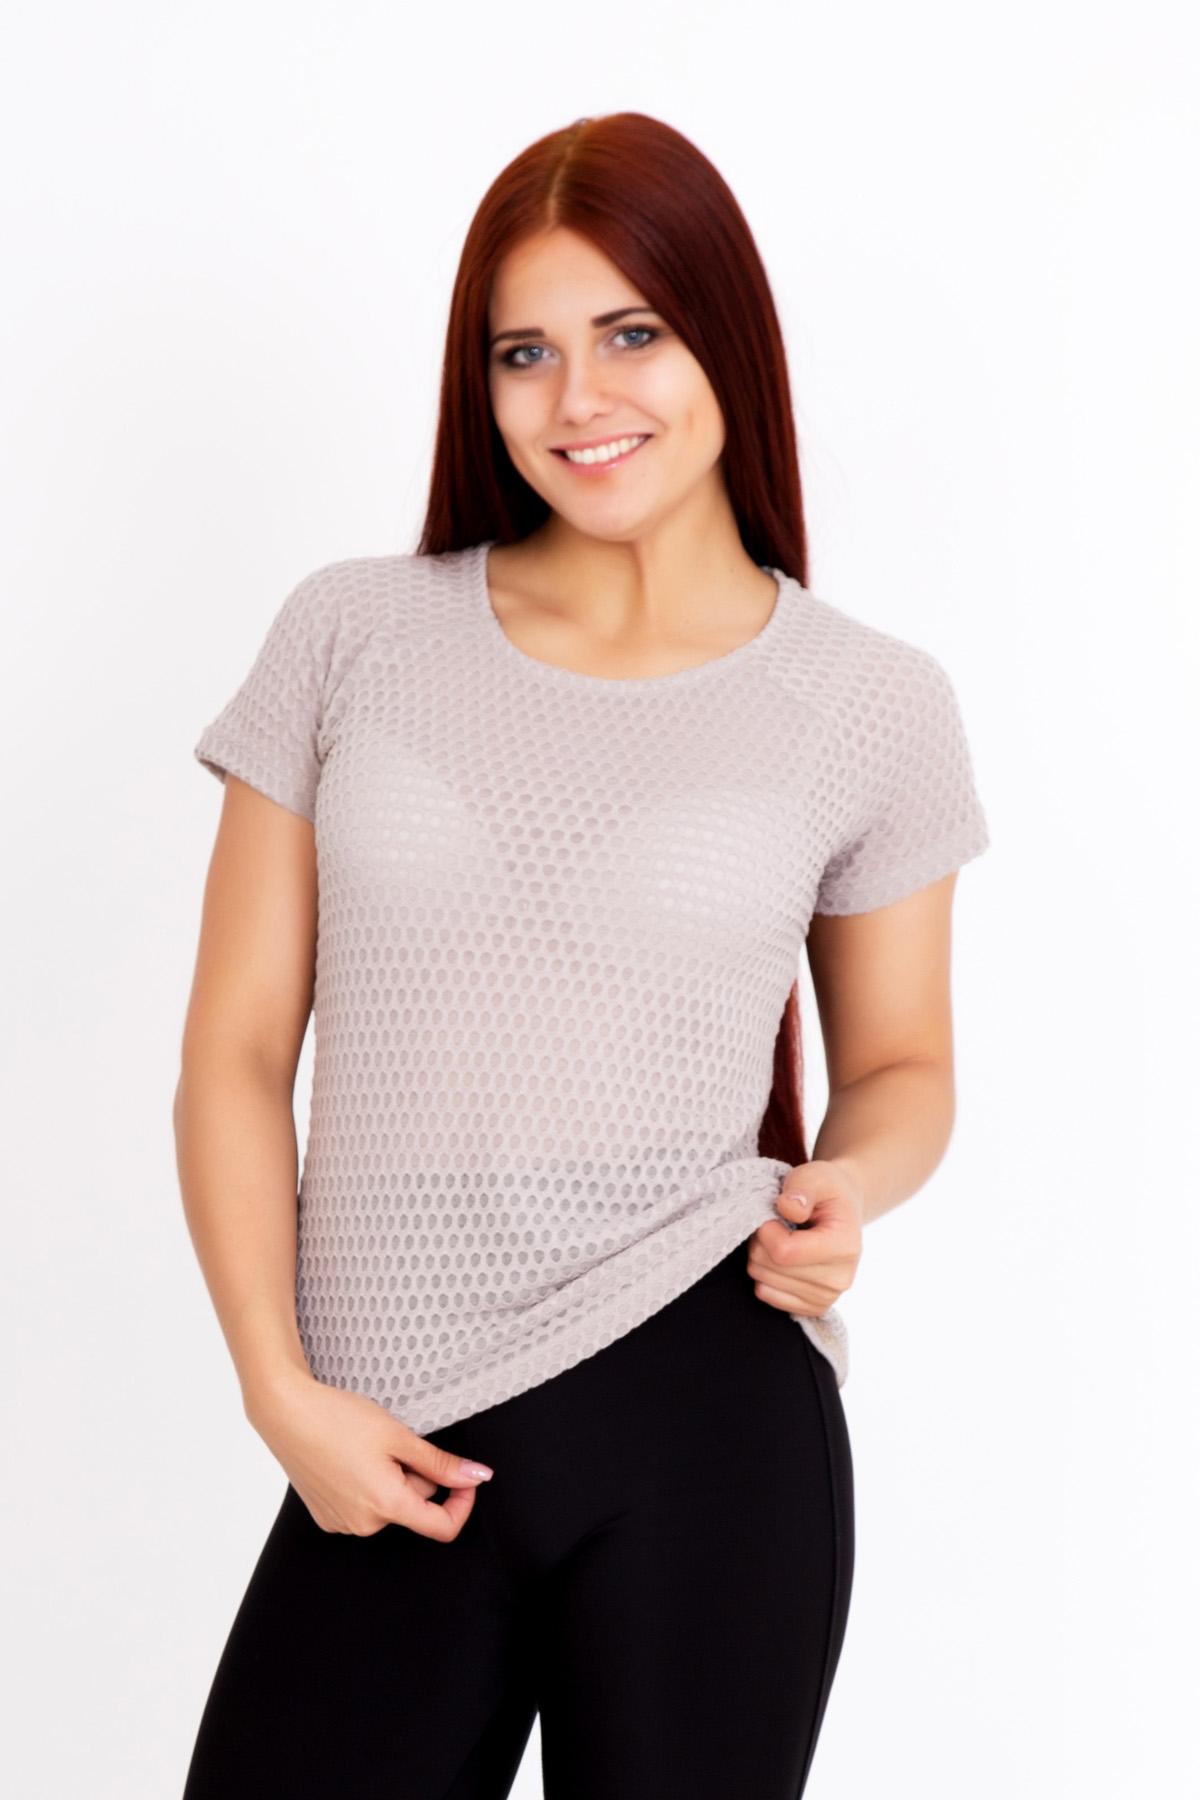 Жен. блуза Ажур Бежевый р. 46Блузы<br>Обхват груди:92 см<br>Обхват талии:74 см<br>Обхват бедер:100 см<br>Длина по спинке:55 см<br>Рост:167 см<br><br>Тип: Жен. блуза<br>Размер: 46<br>Материал: Вискоза